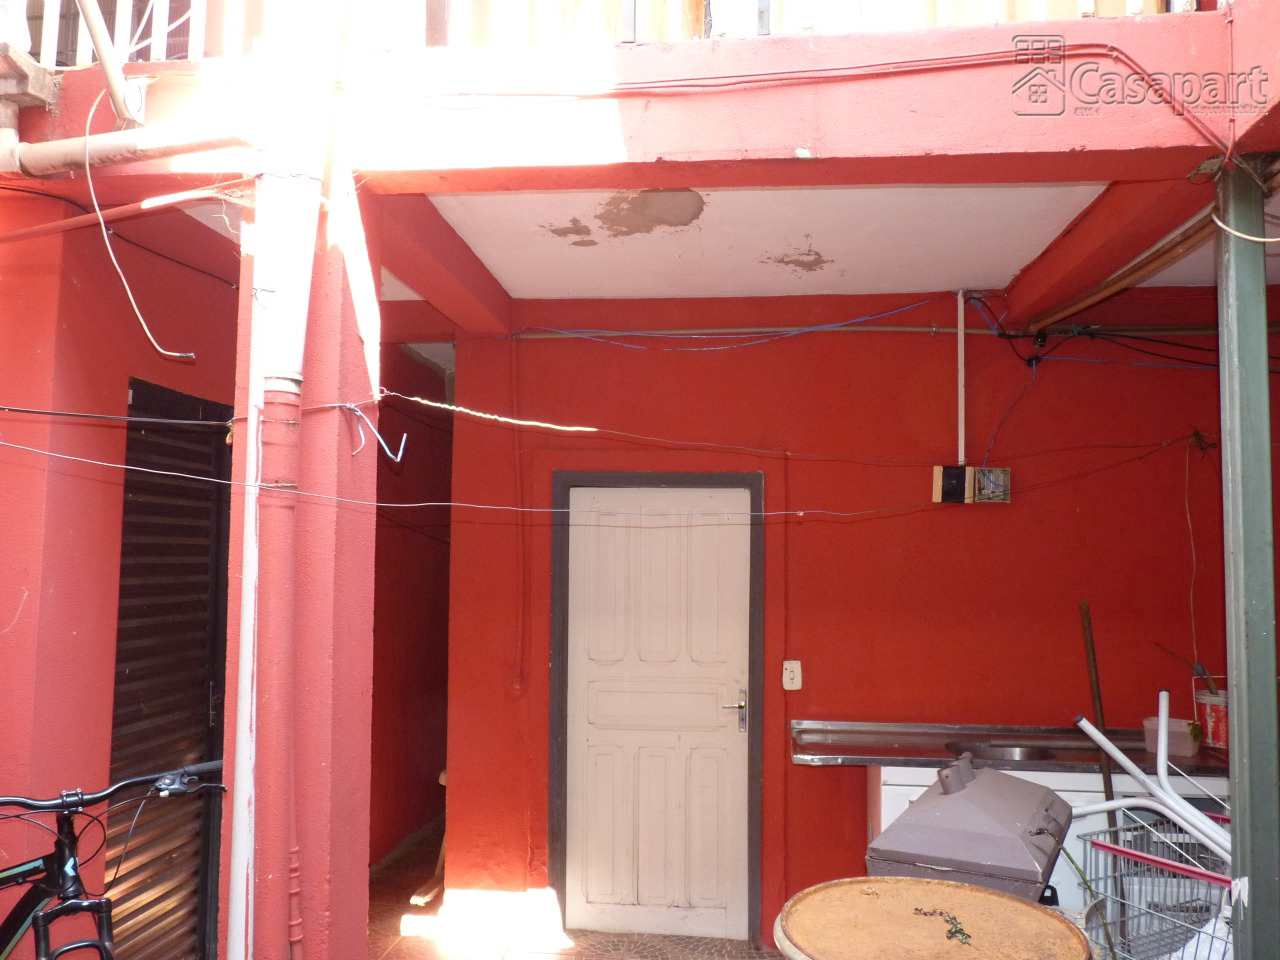 Kitnet com 1 quarto, Vila Rica, Campo Grande - MS